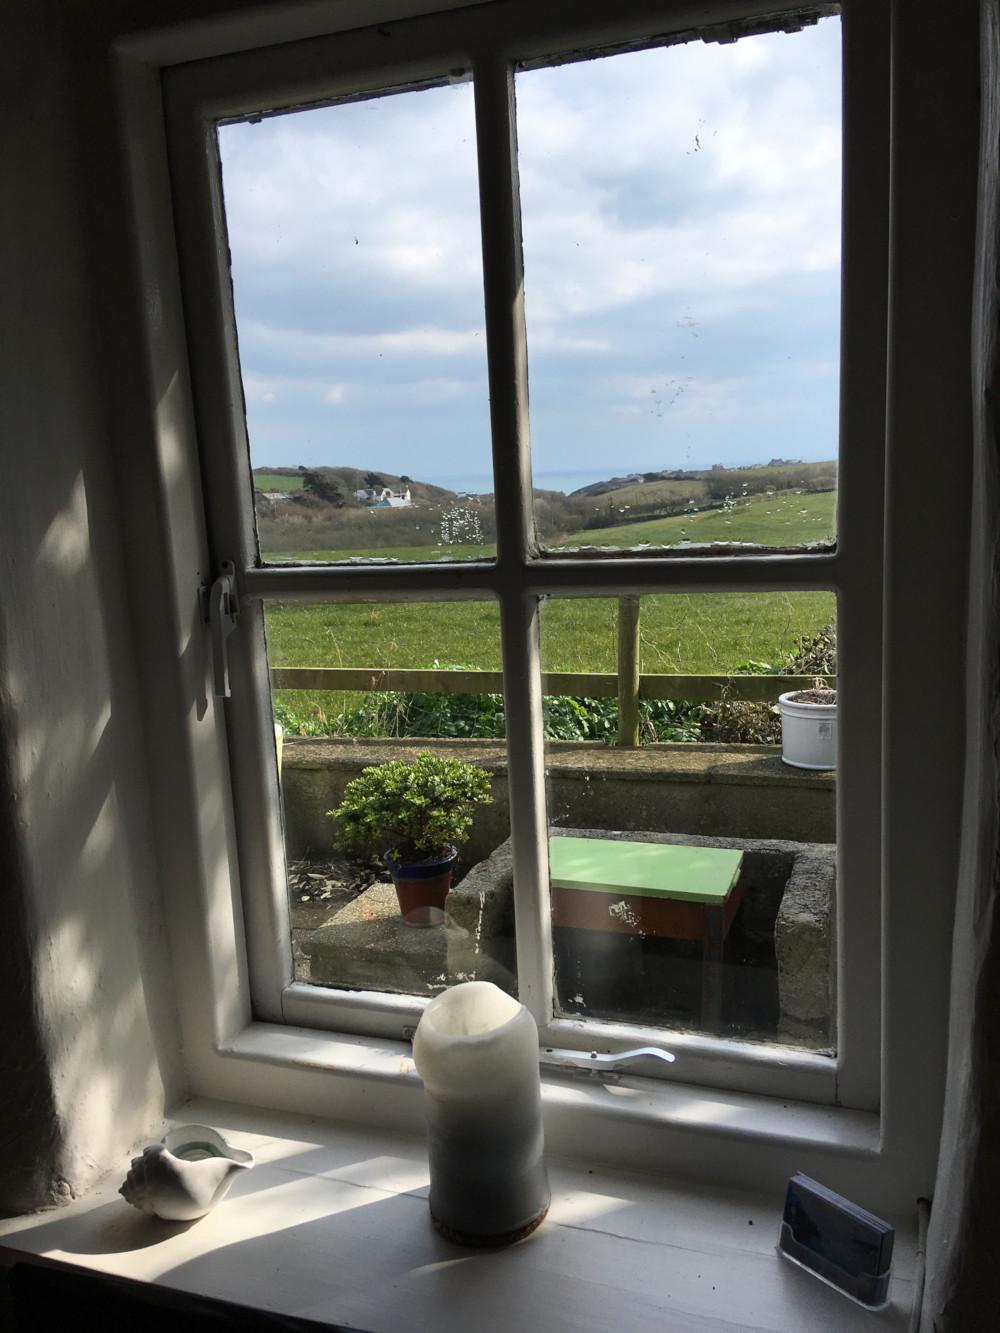 Across Cornish fields to the sea